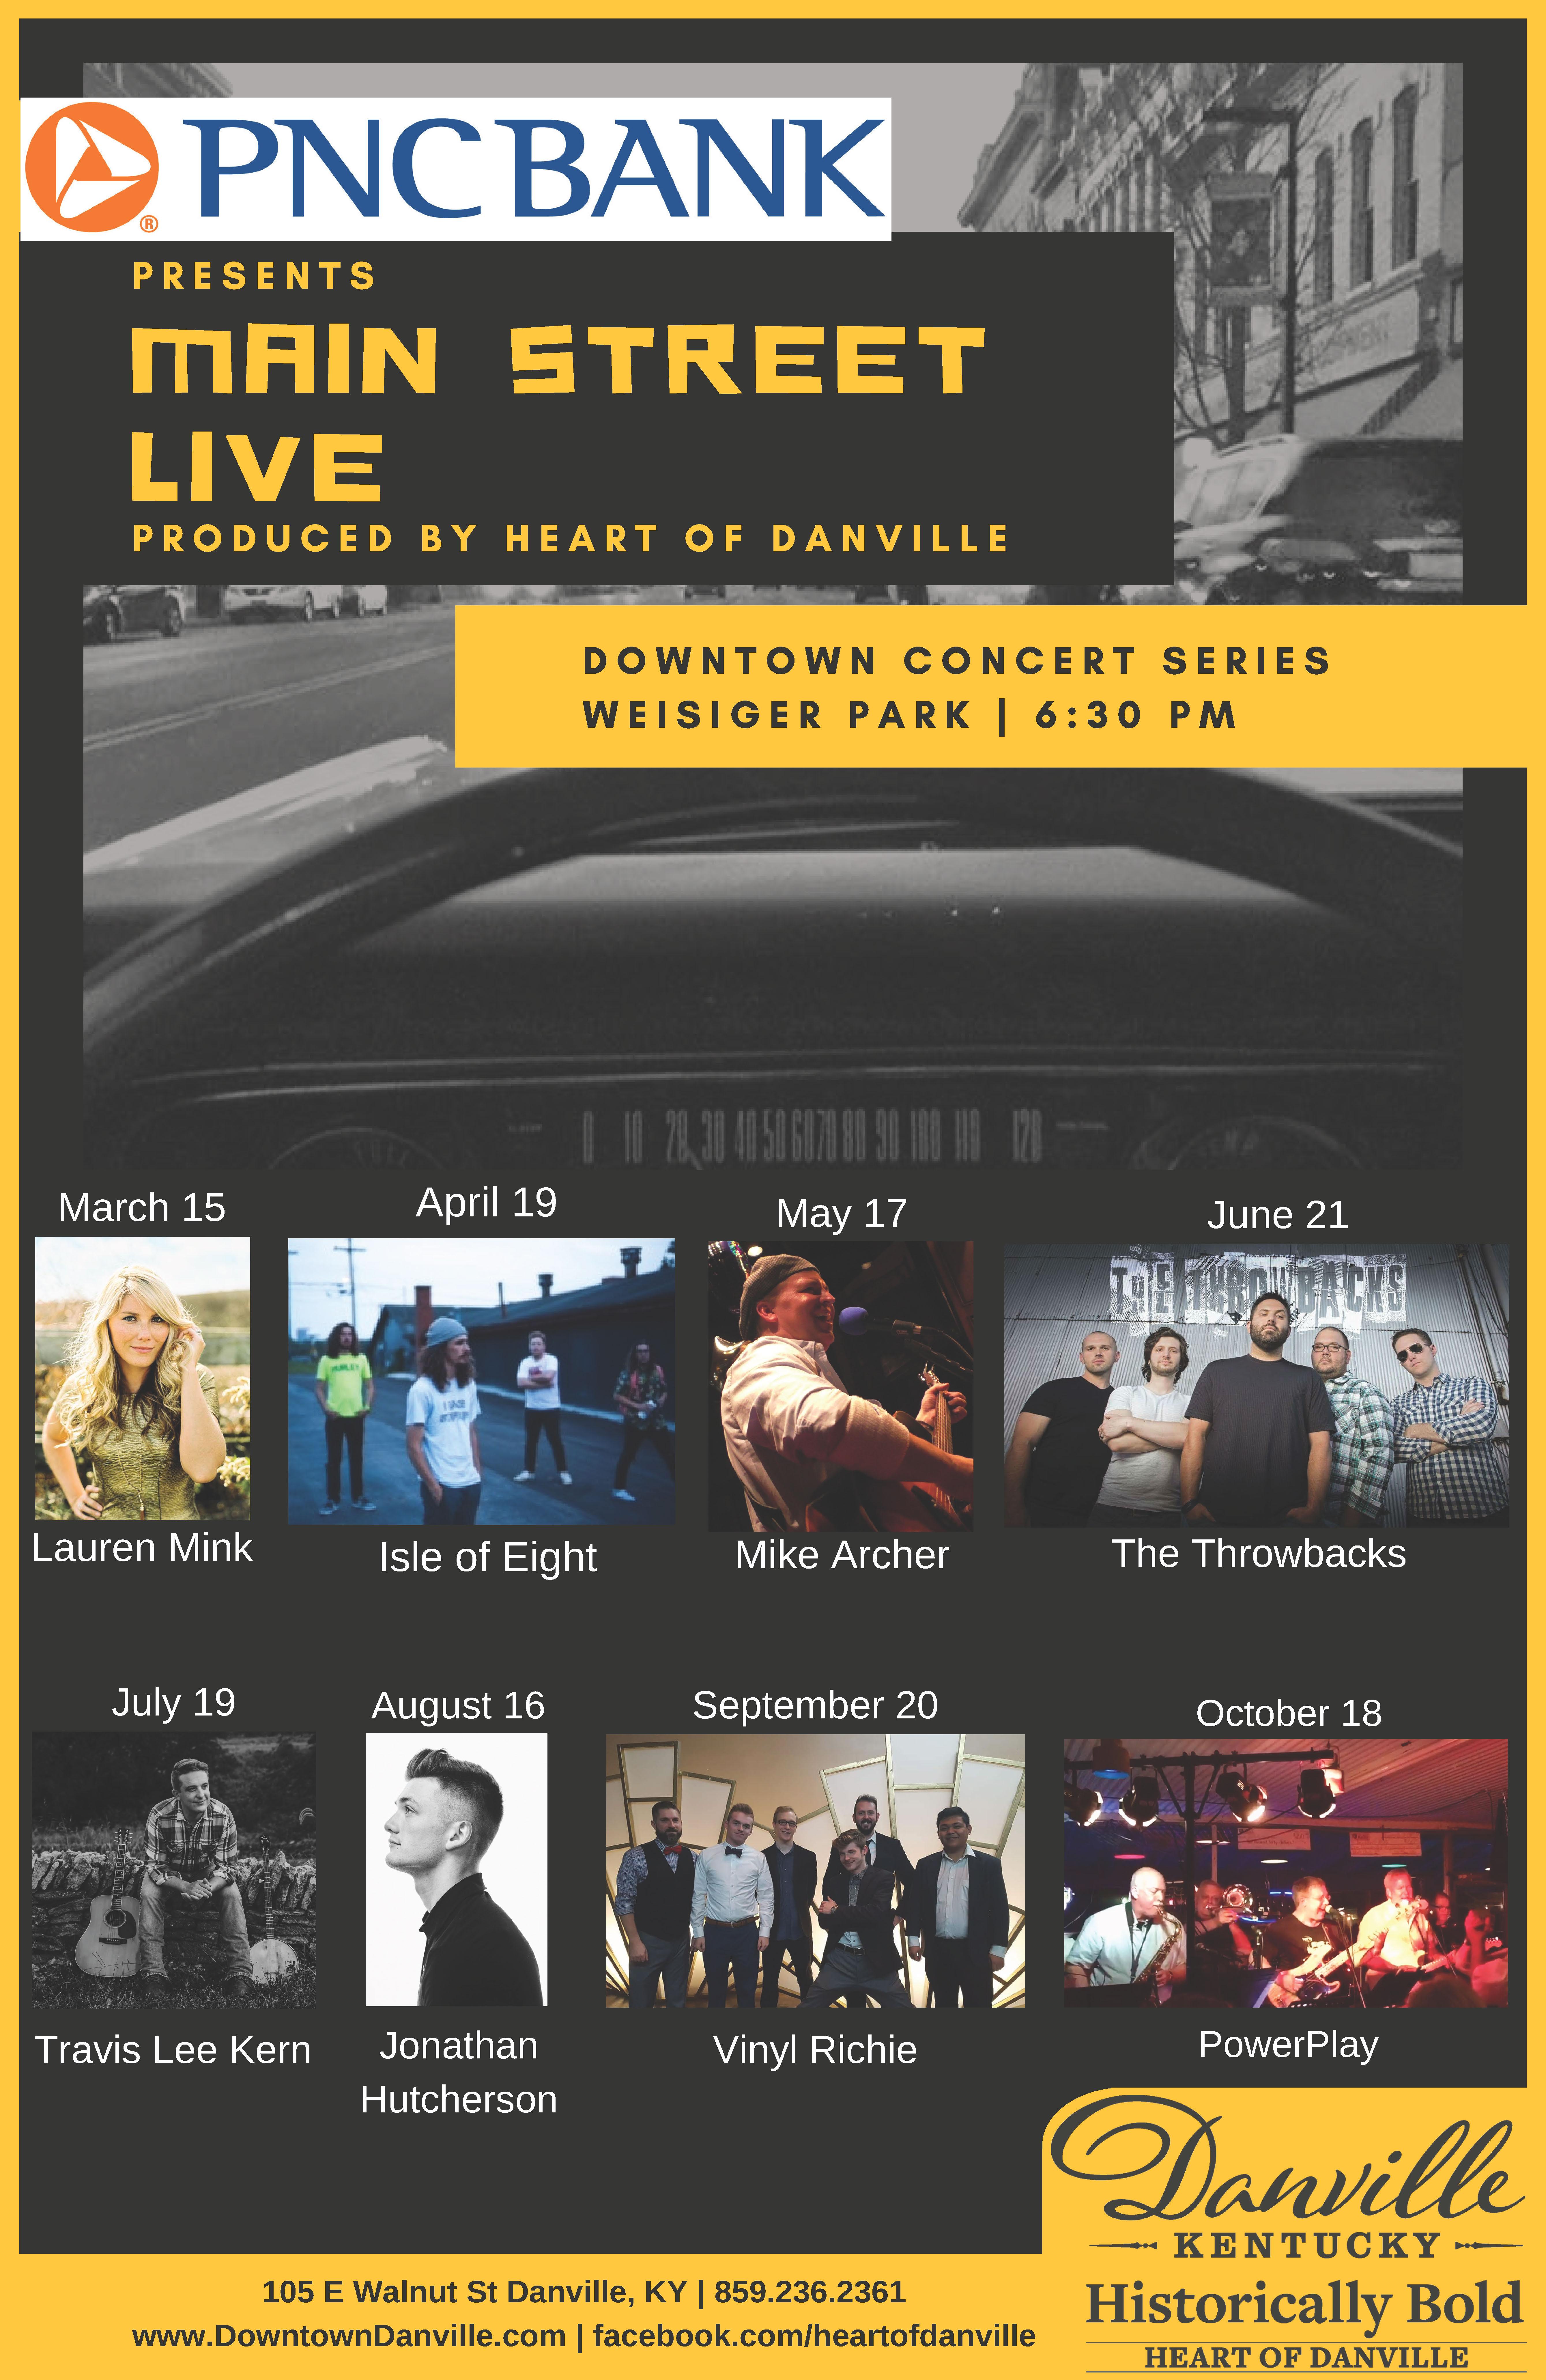 Business Spotlight - PNC Bank - Heart of Danville Main